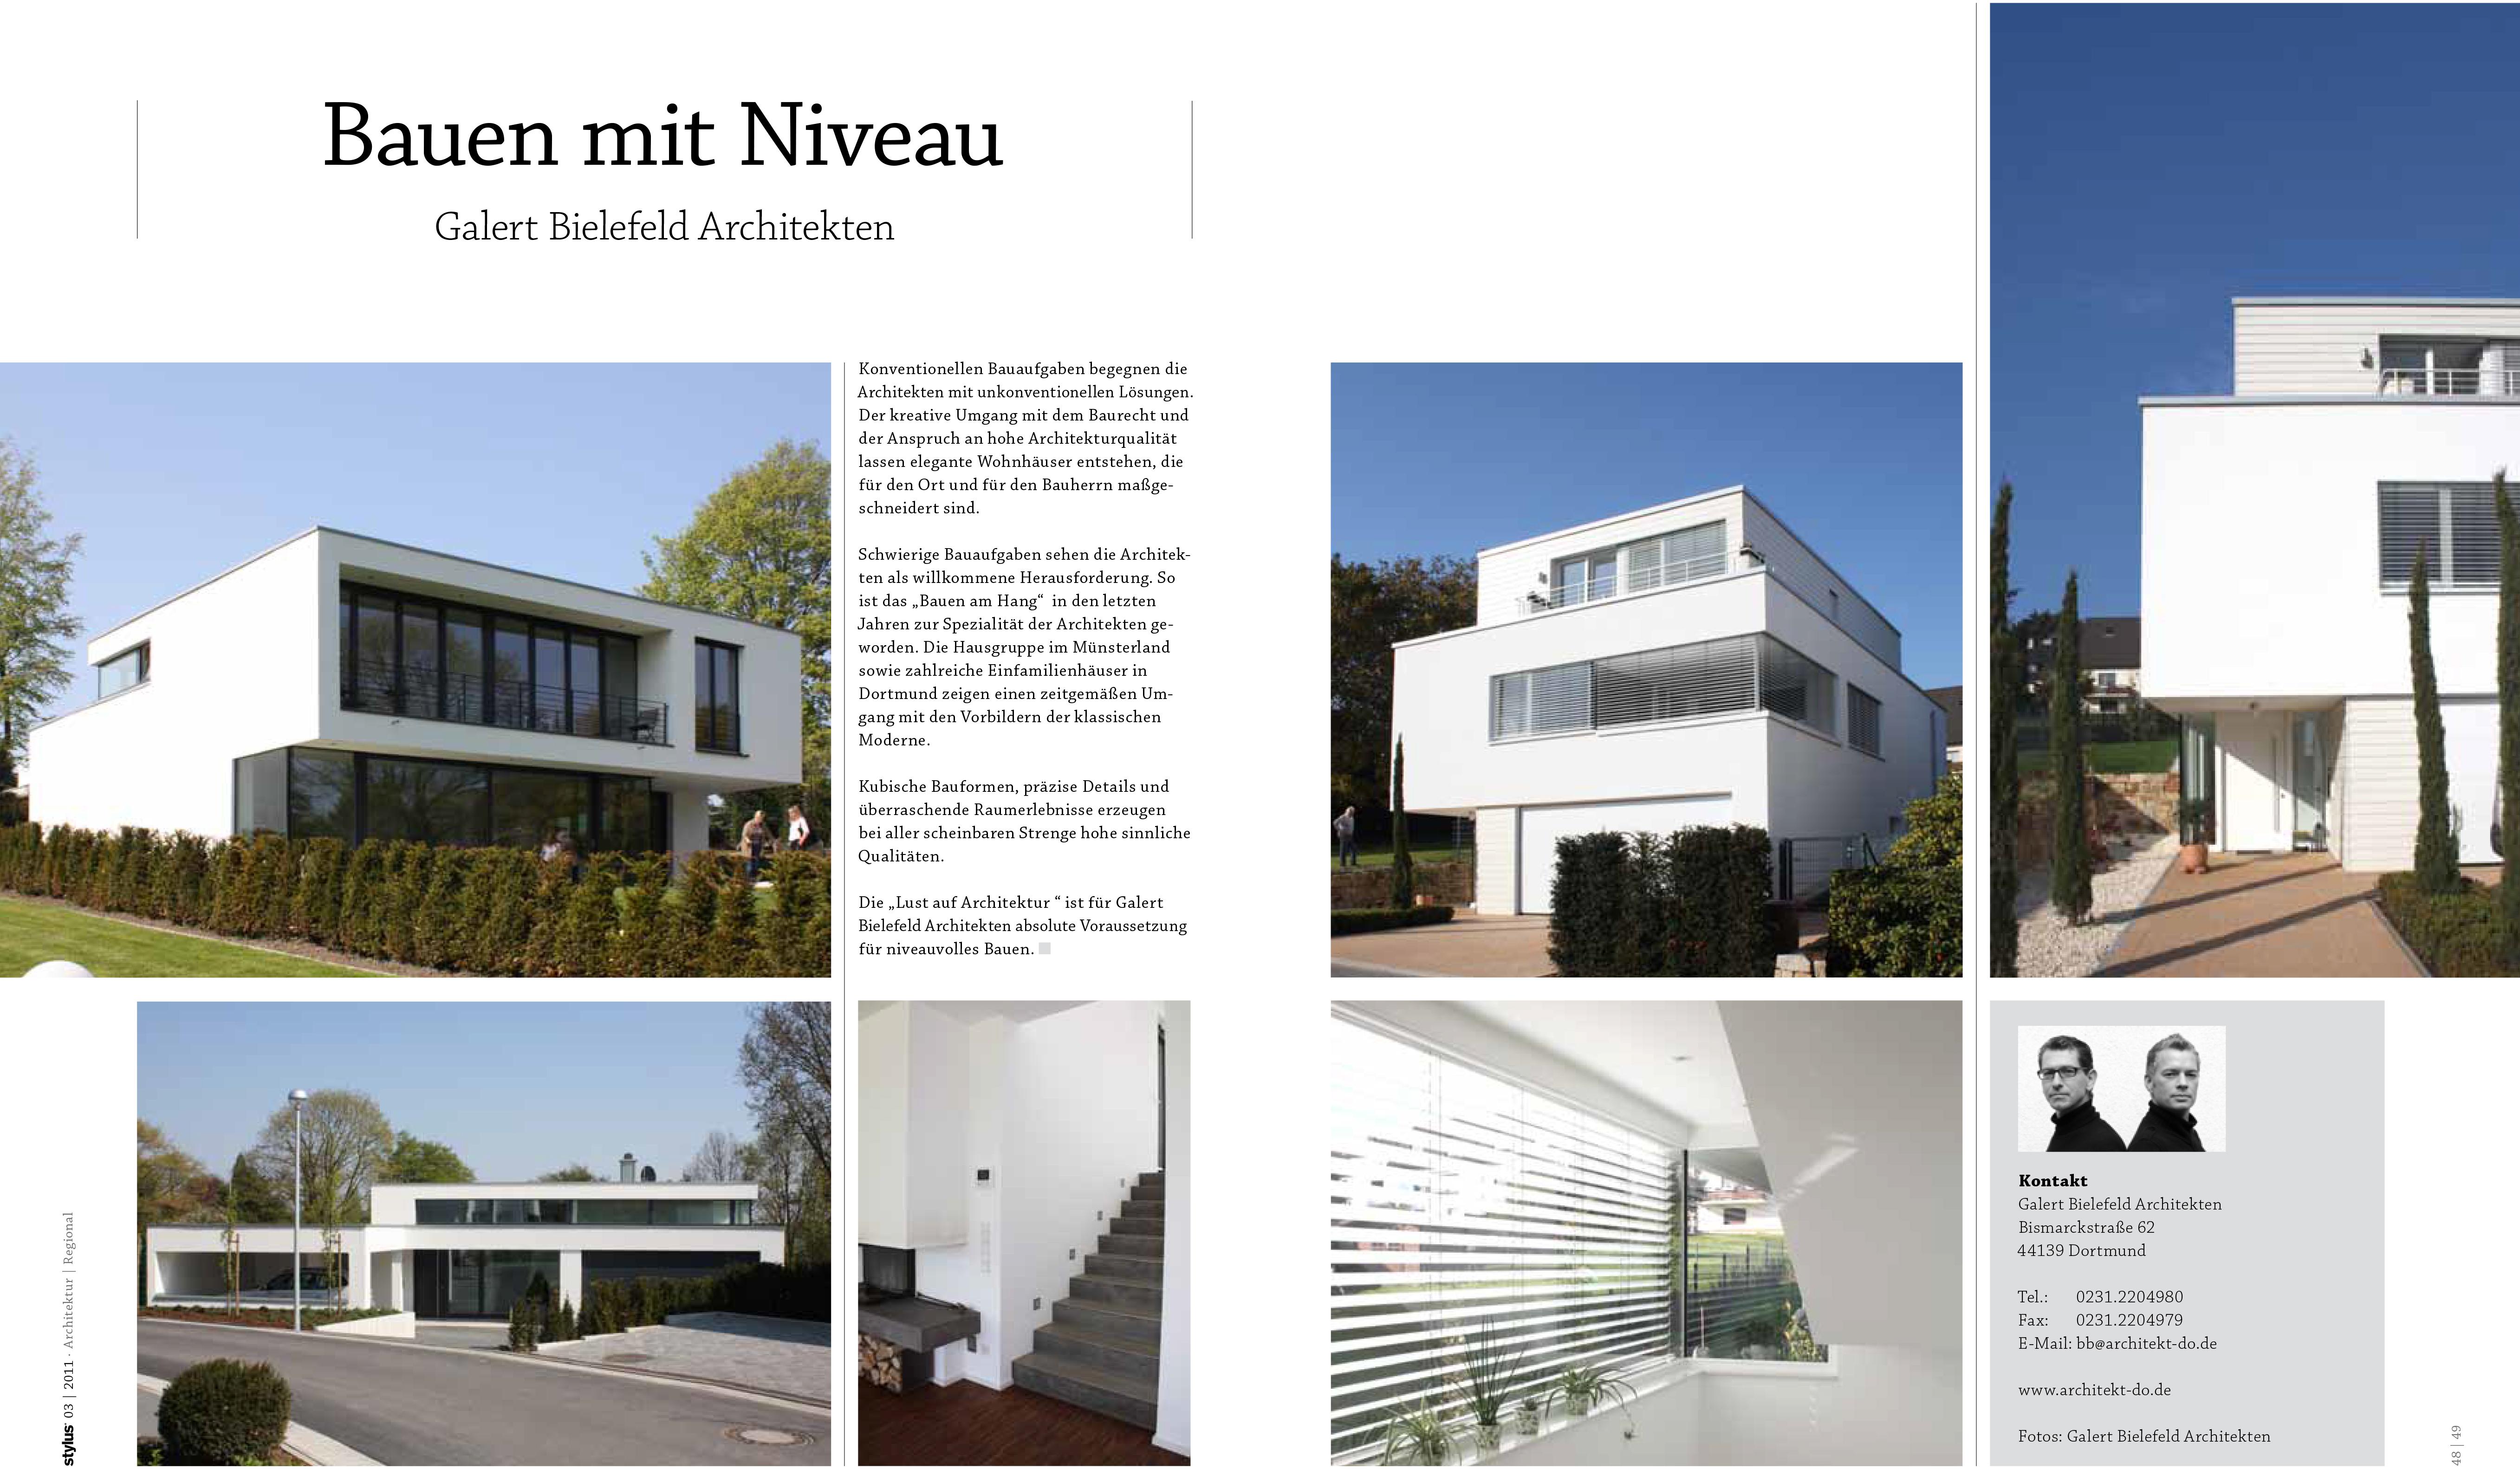 Bielefeld Architekten bielefeld architekten